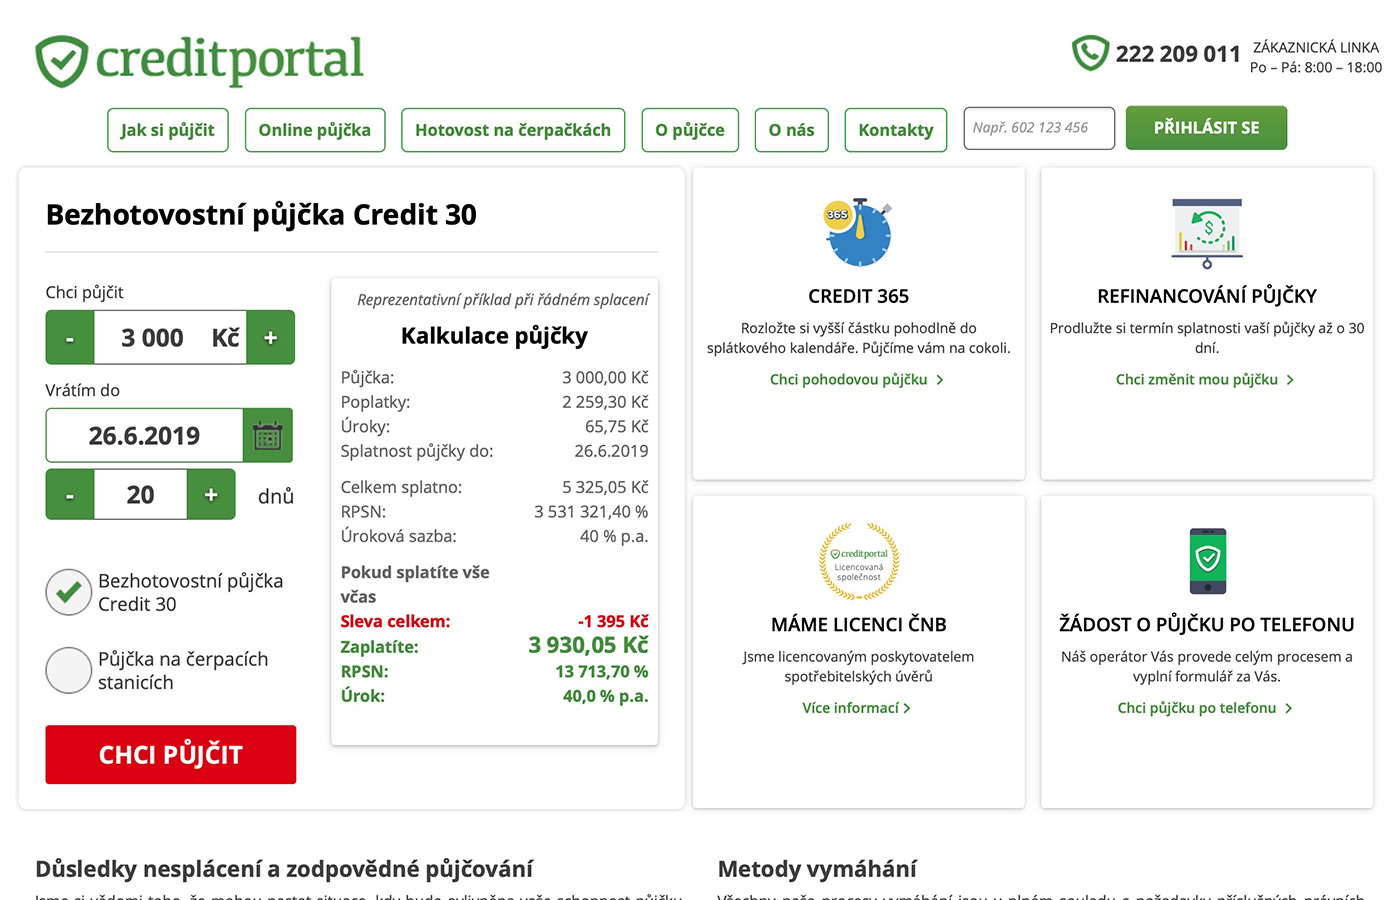 Webové stránky https://www.creditportal.cz/cs/credit365/